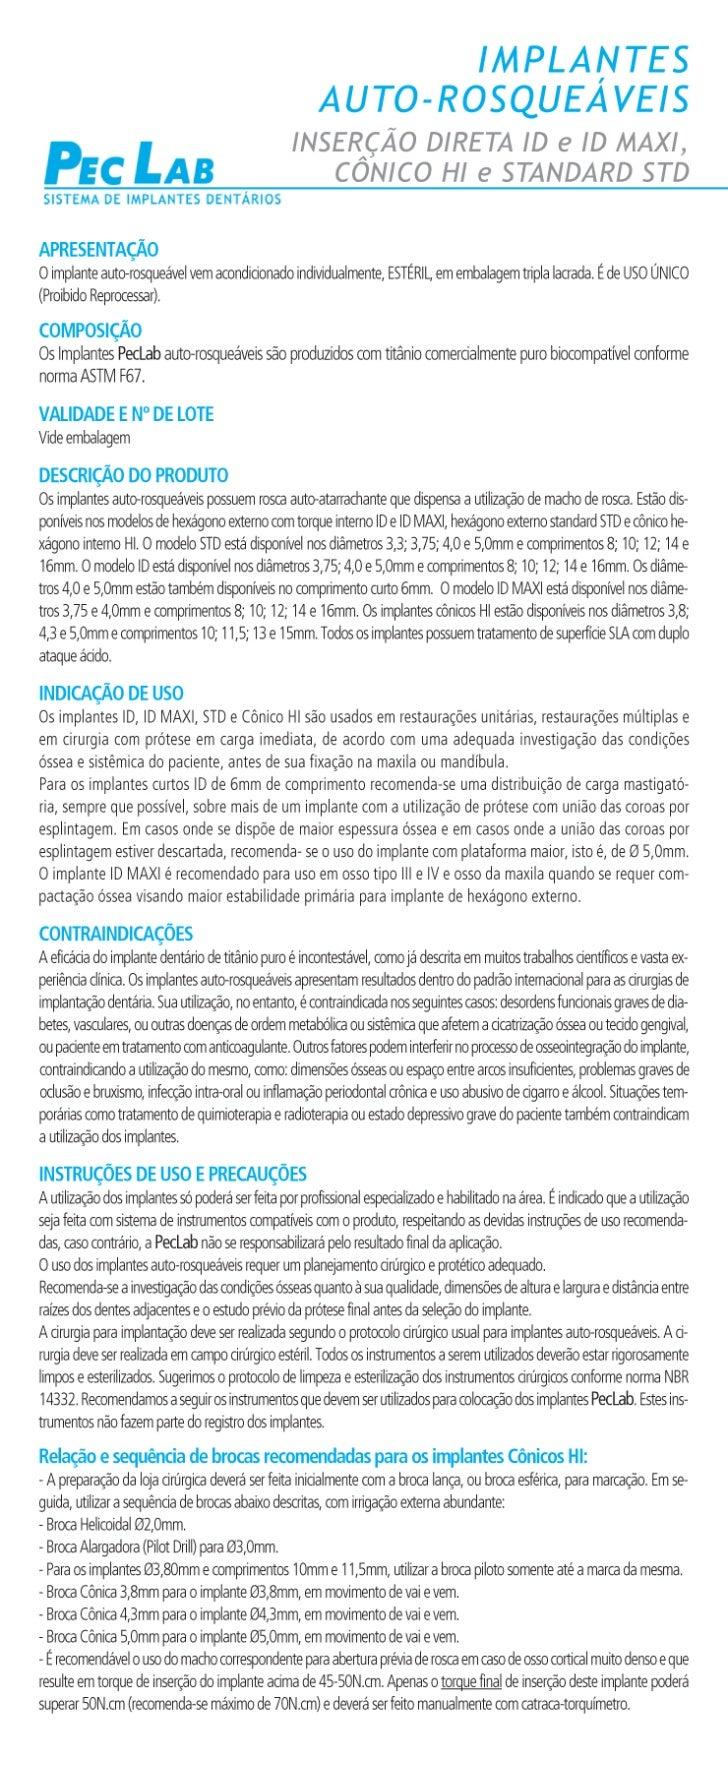 Implantes Autorosqueaveis Id e Standard pag1